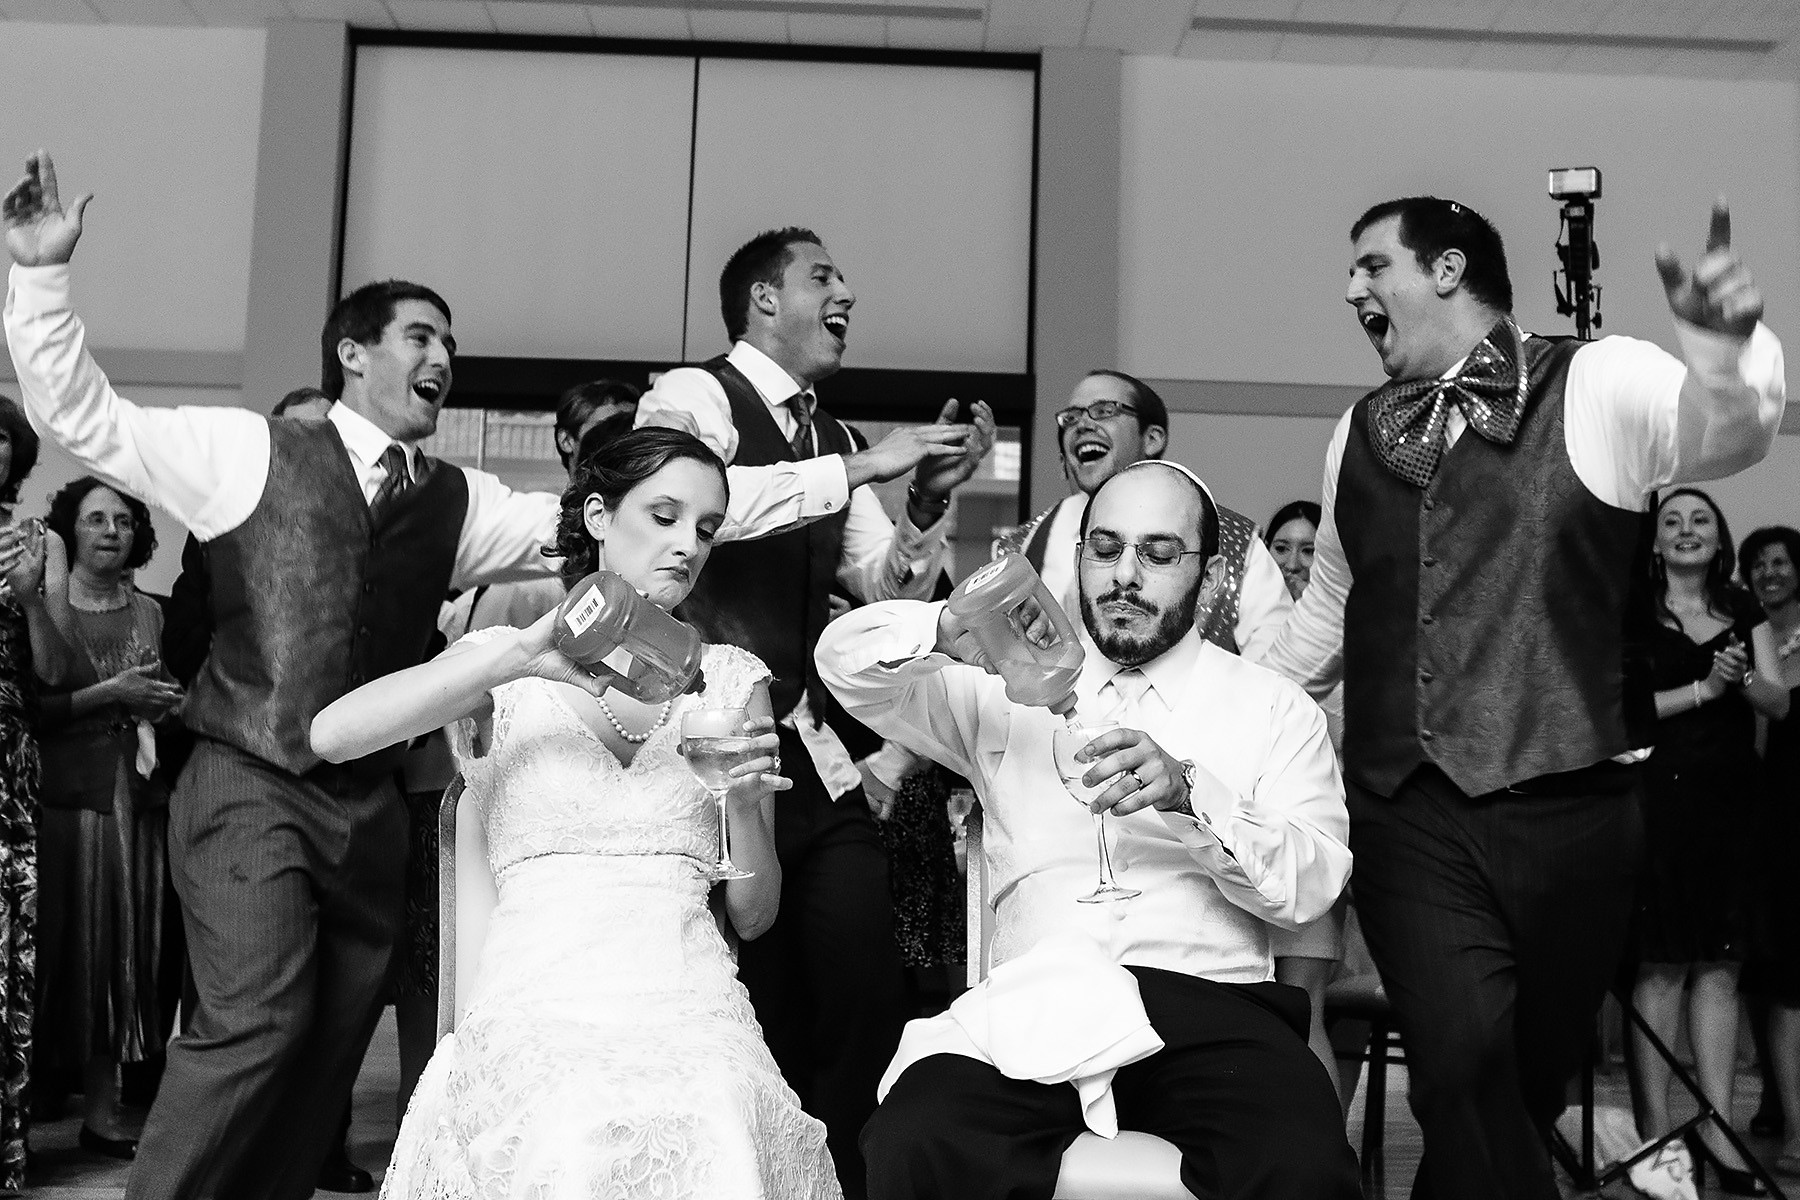 Horah Jewish Wedding Tradition